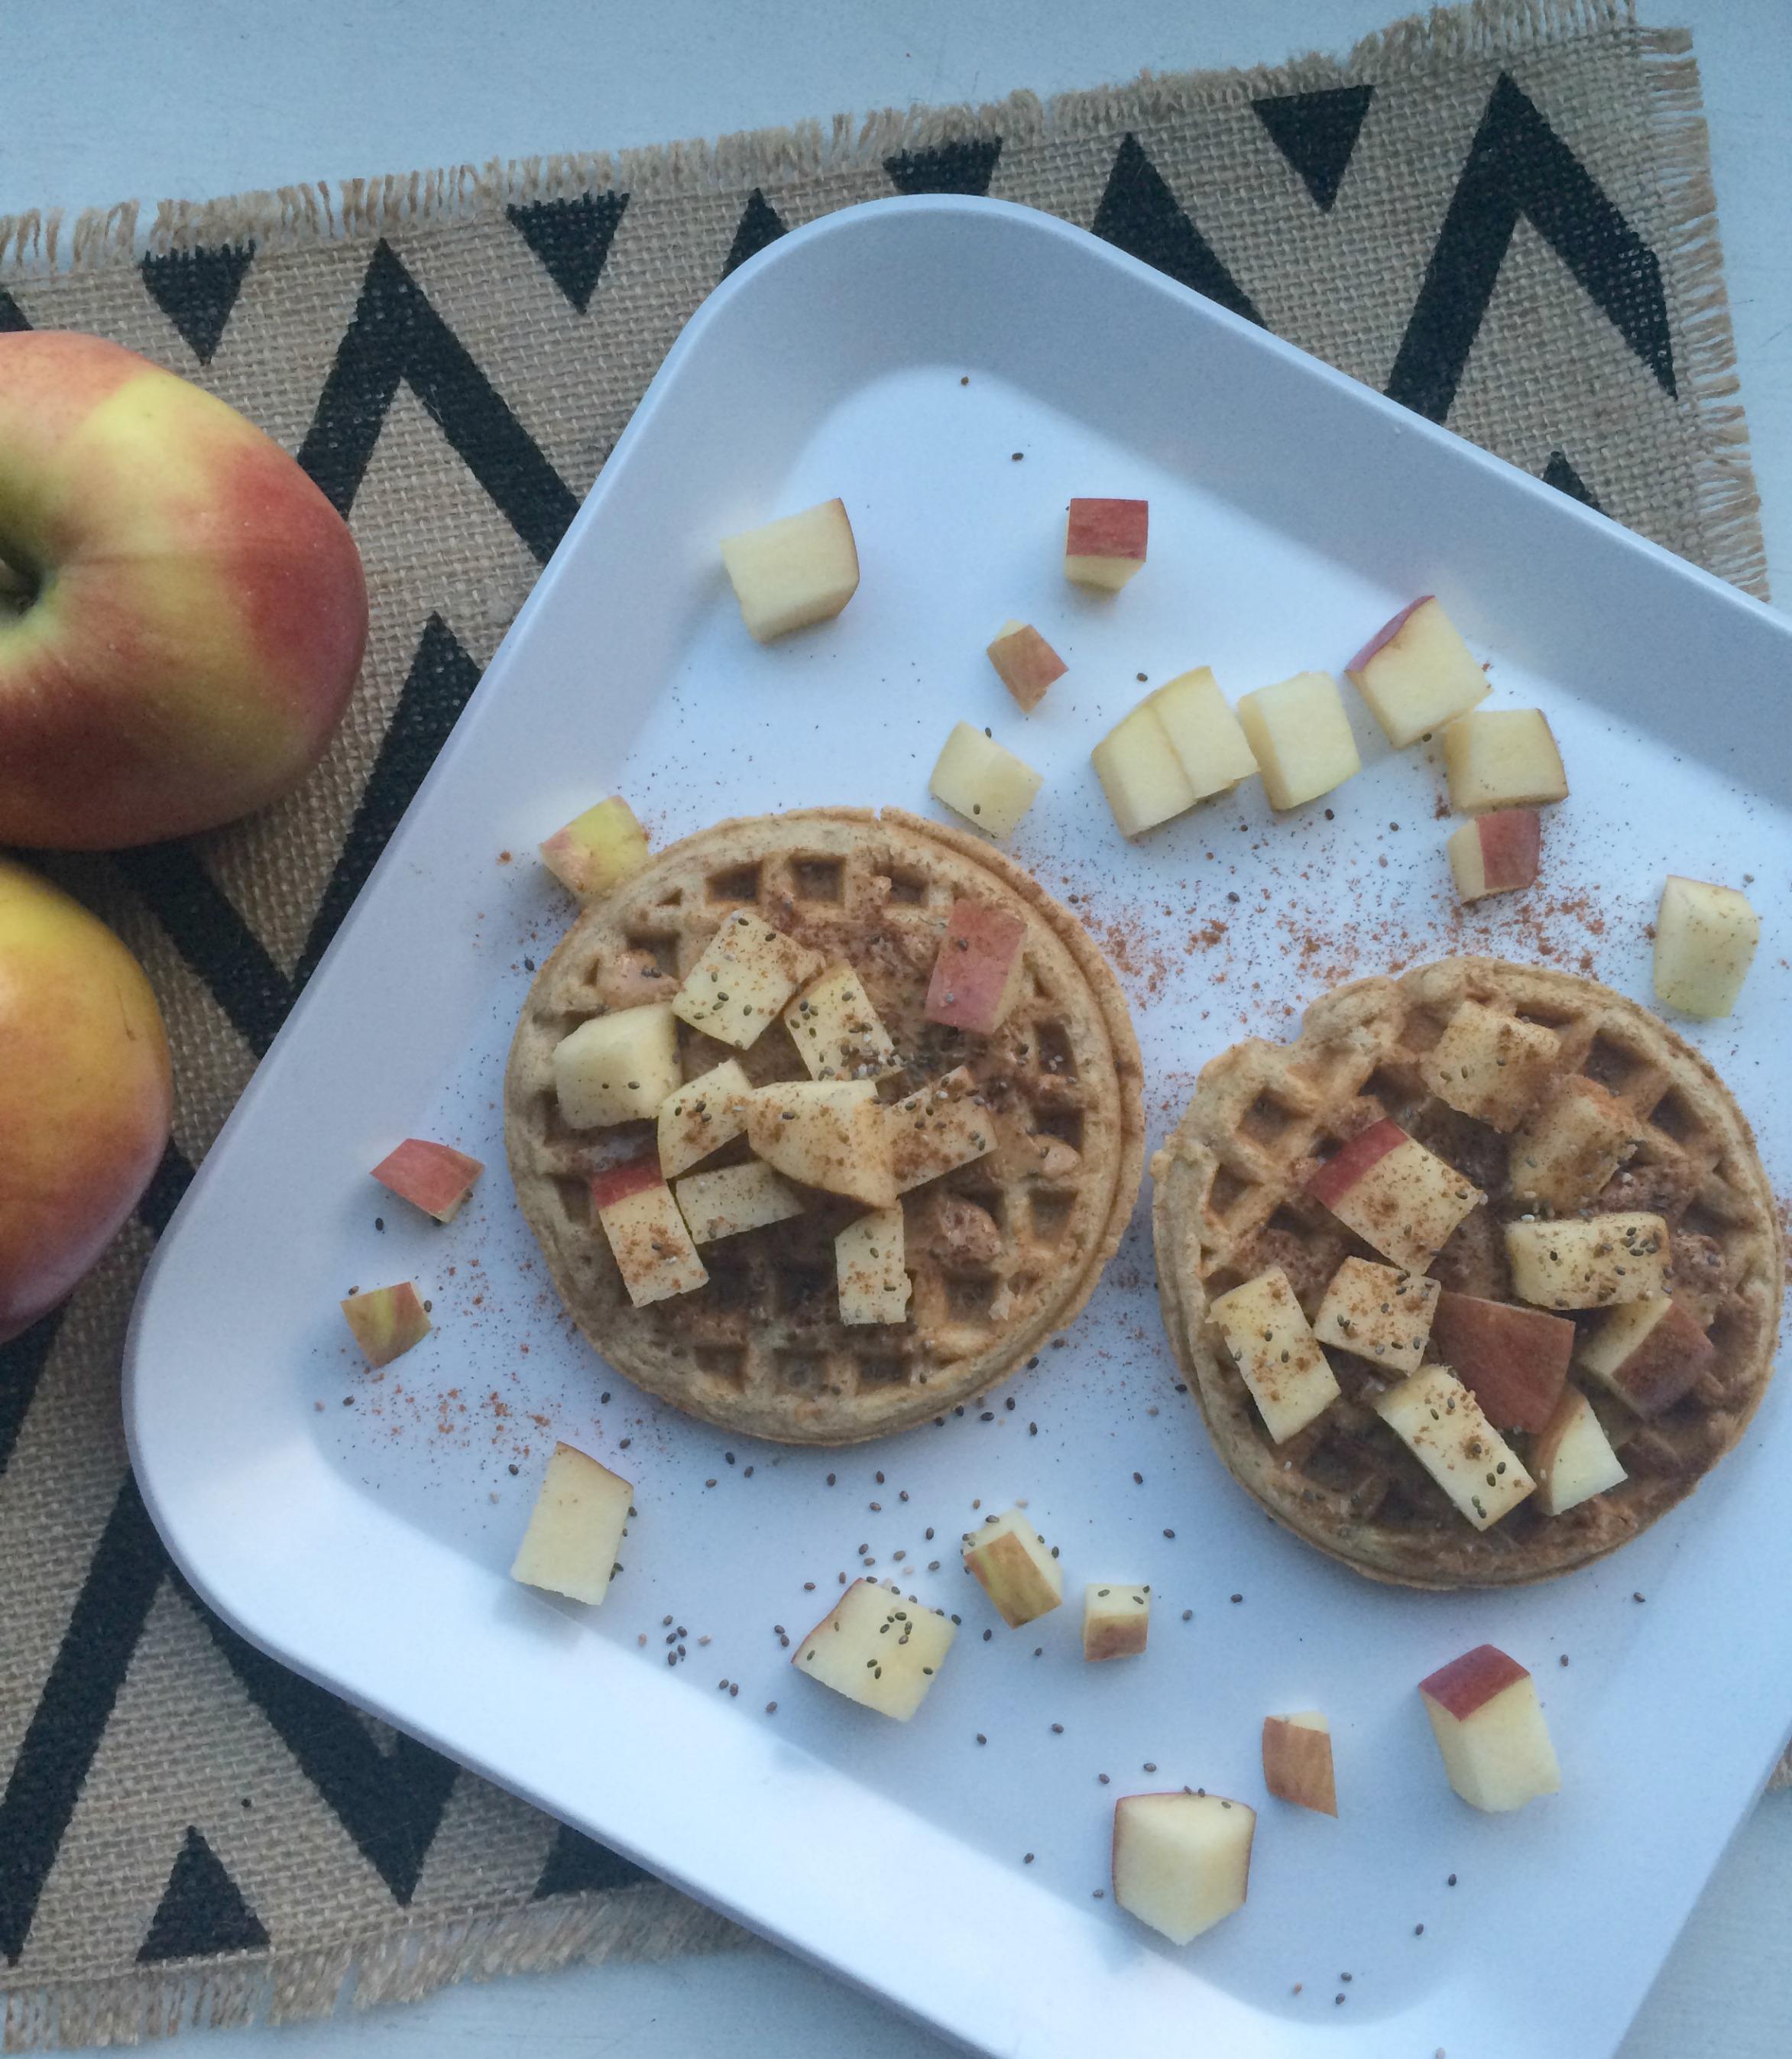 Apple Peanut Butter Waffles